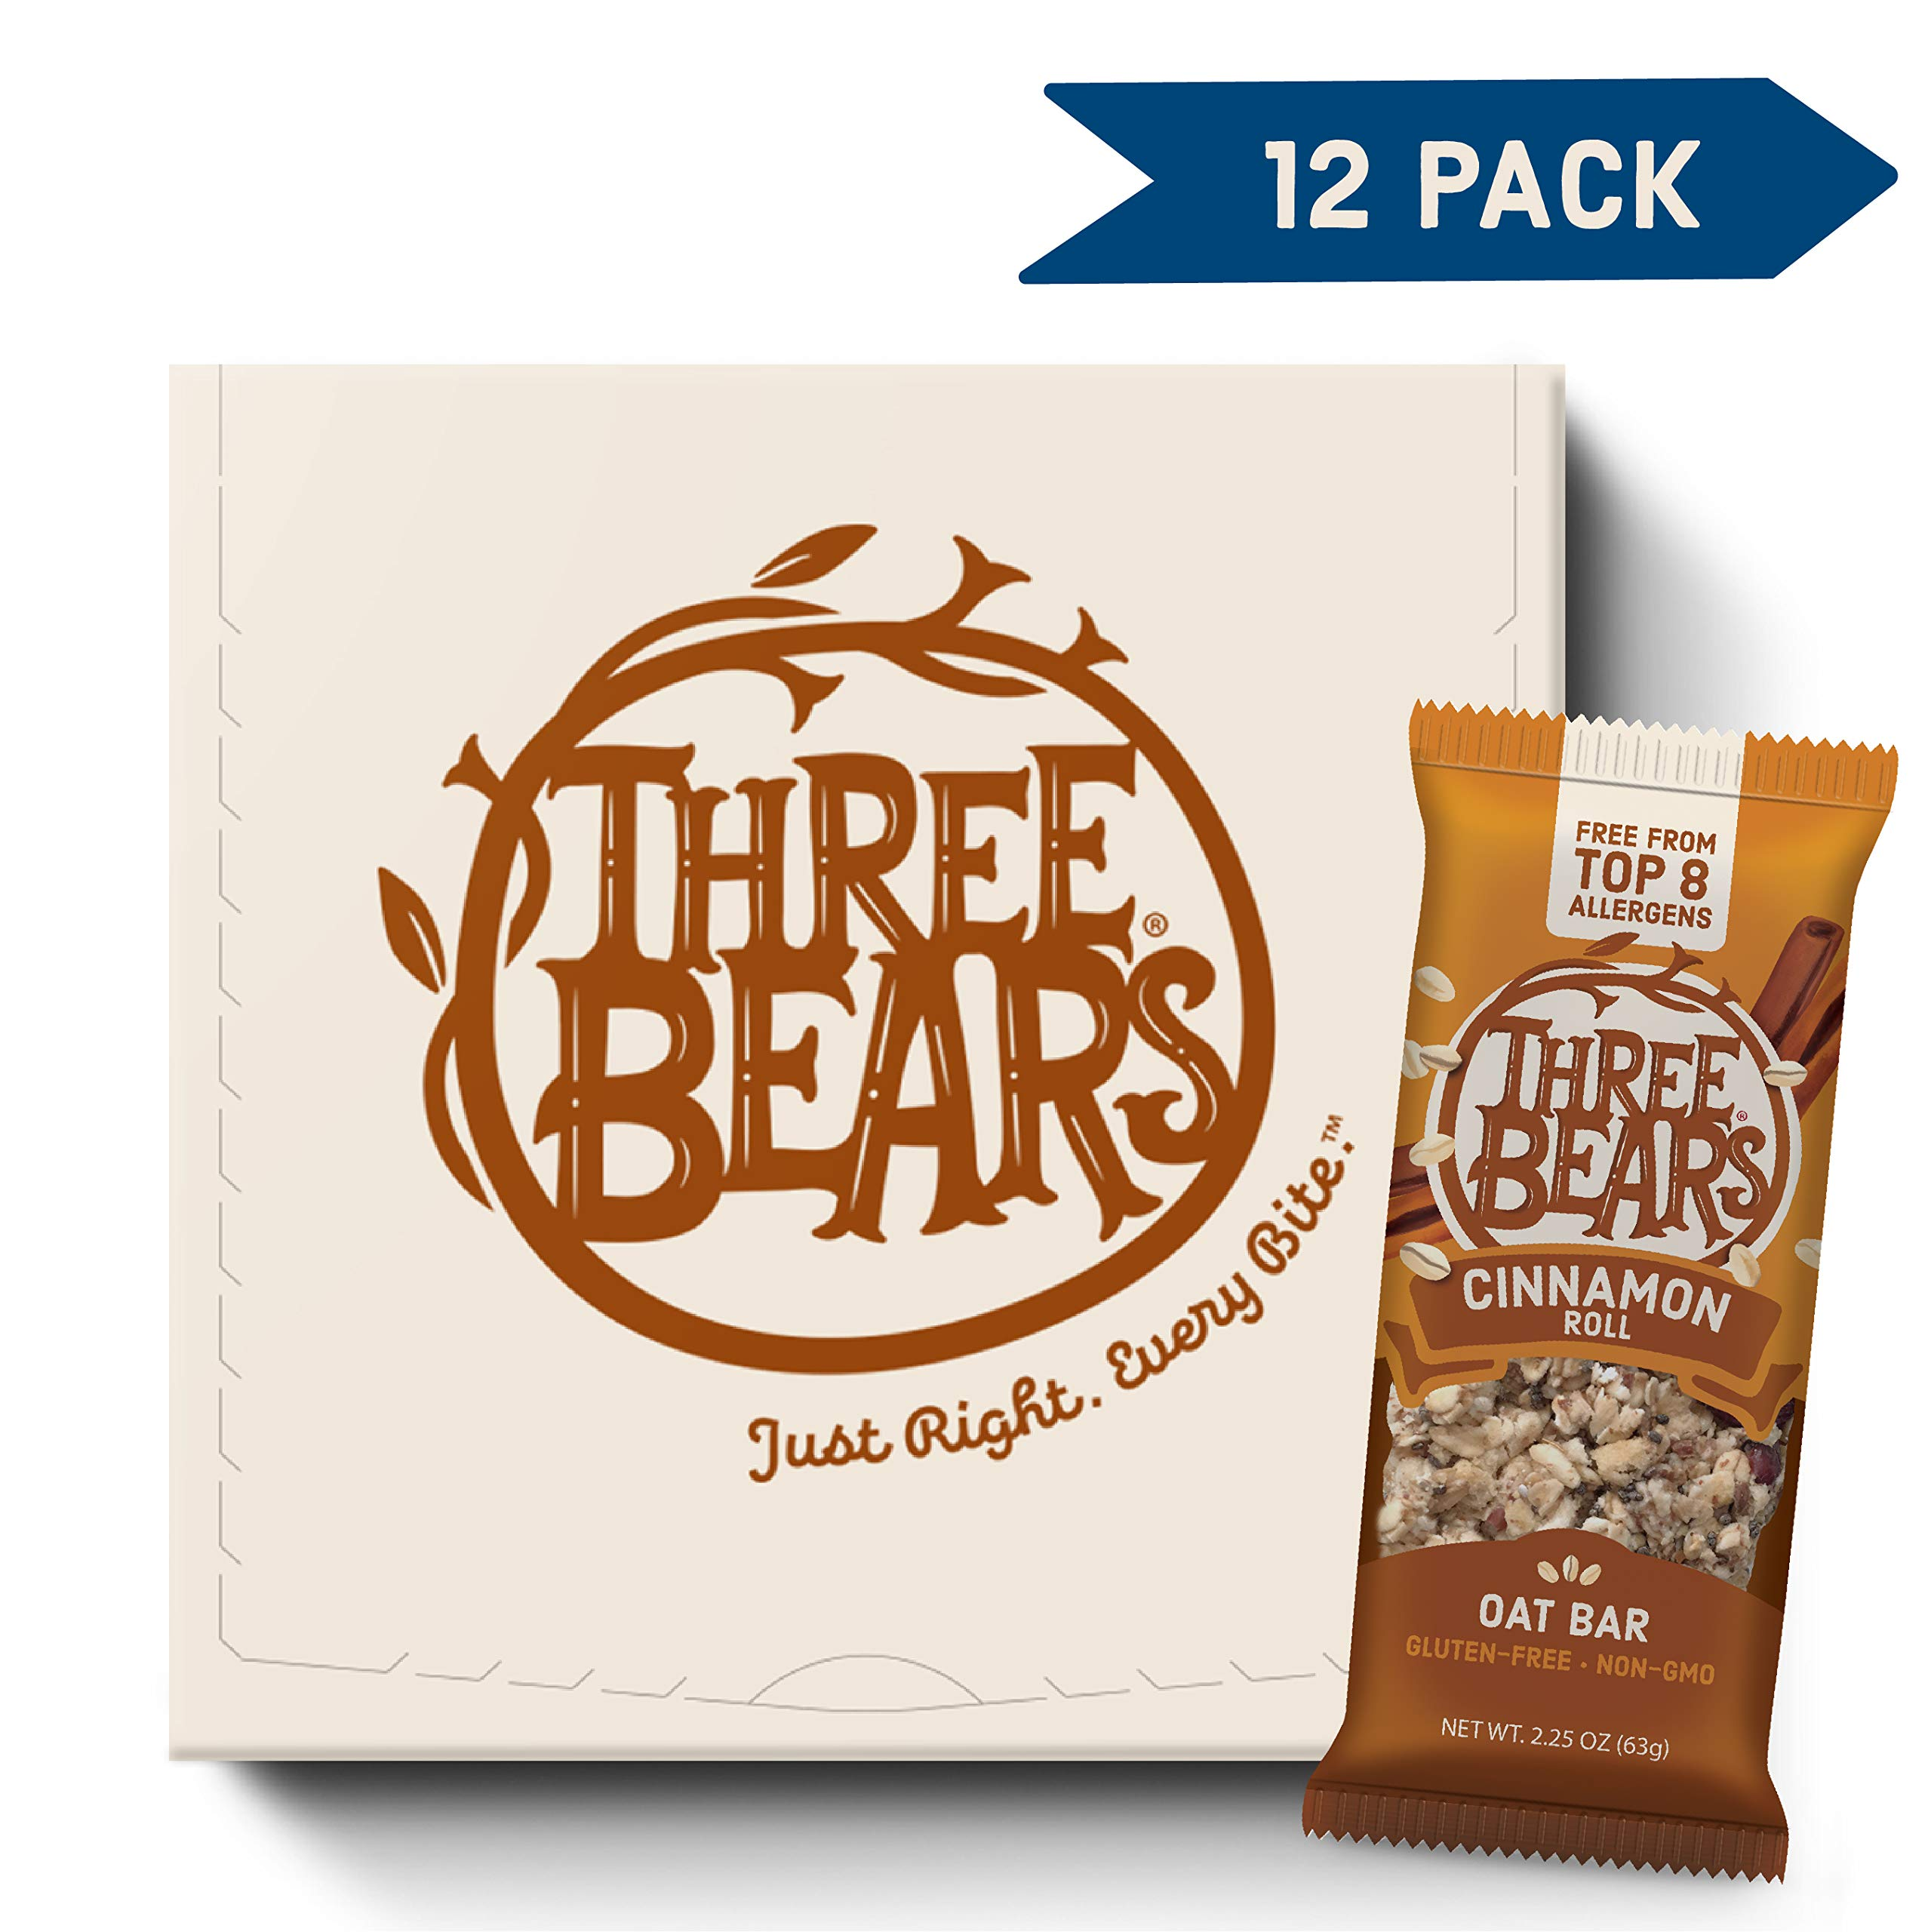 Three Bears Gluten Free Oat Bars, Cinnamon Roll, 2.25 Ounce (Pack of 12) by Three Bears